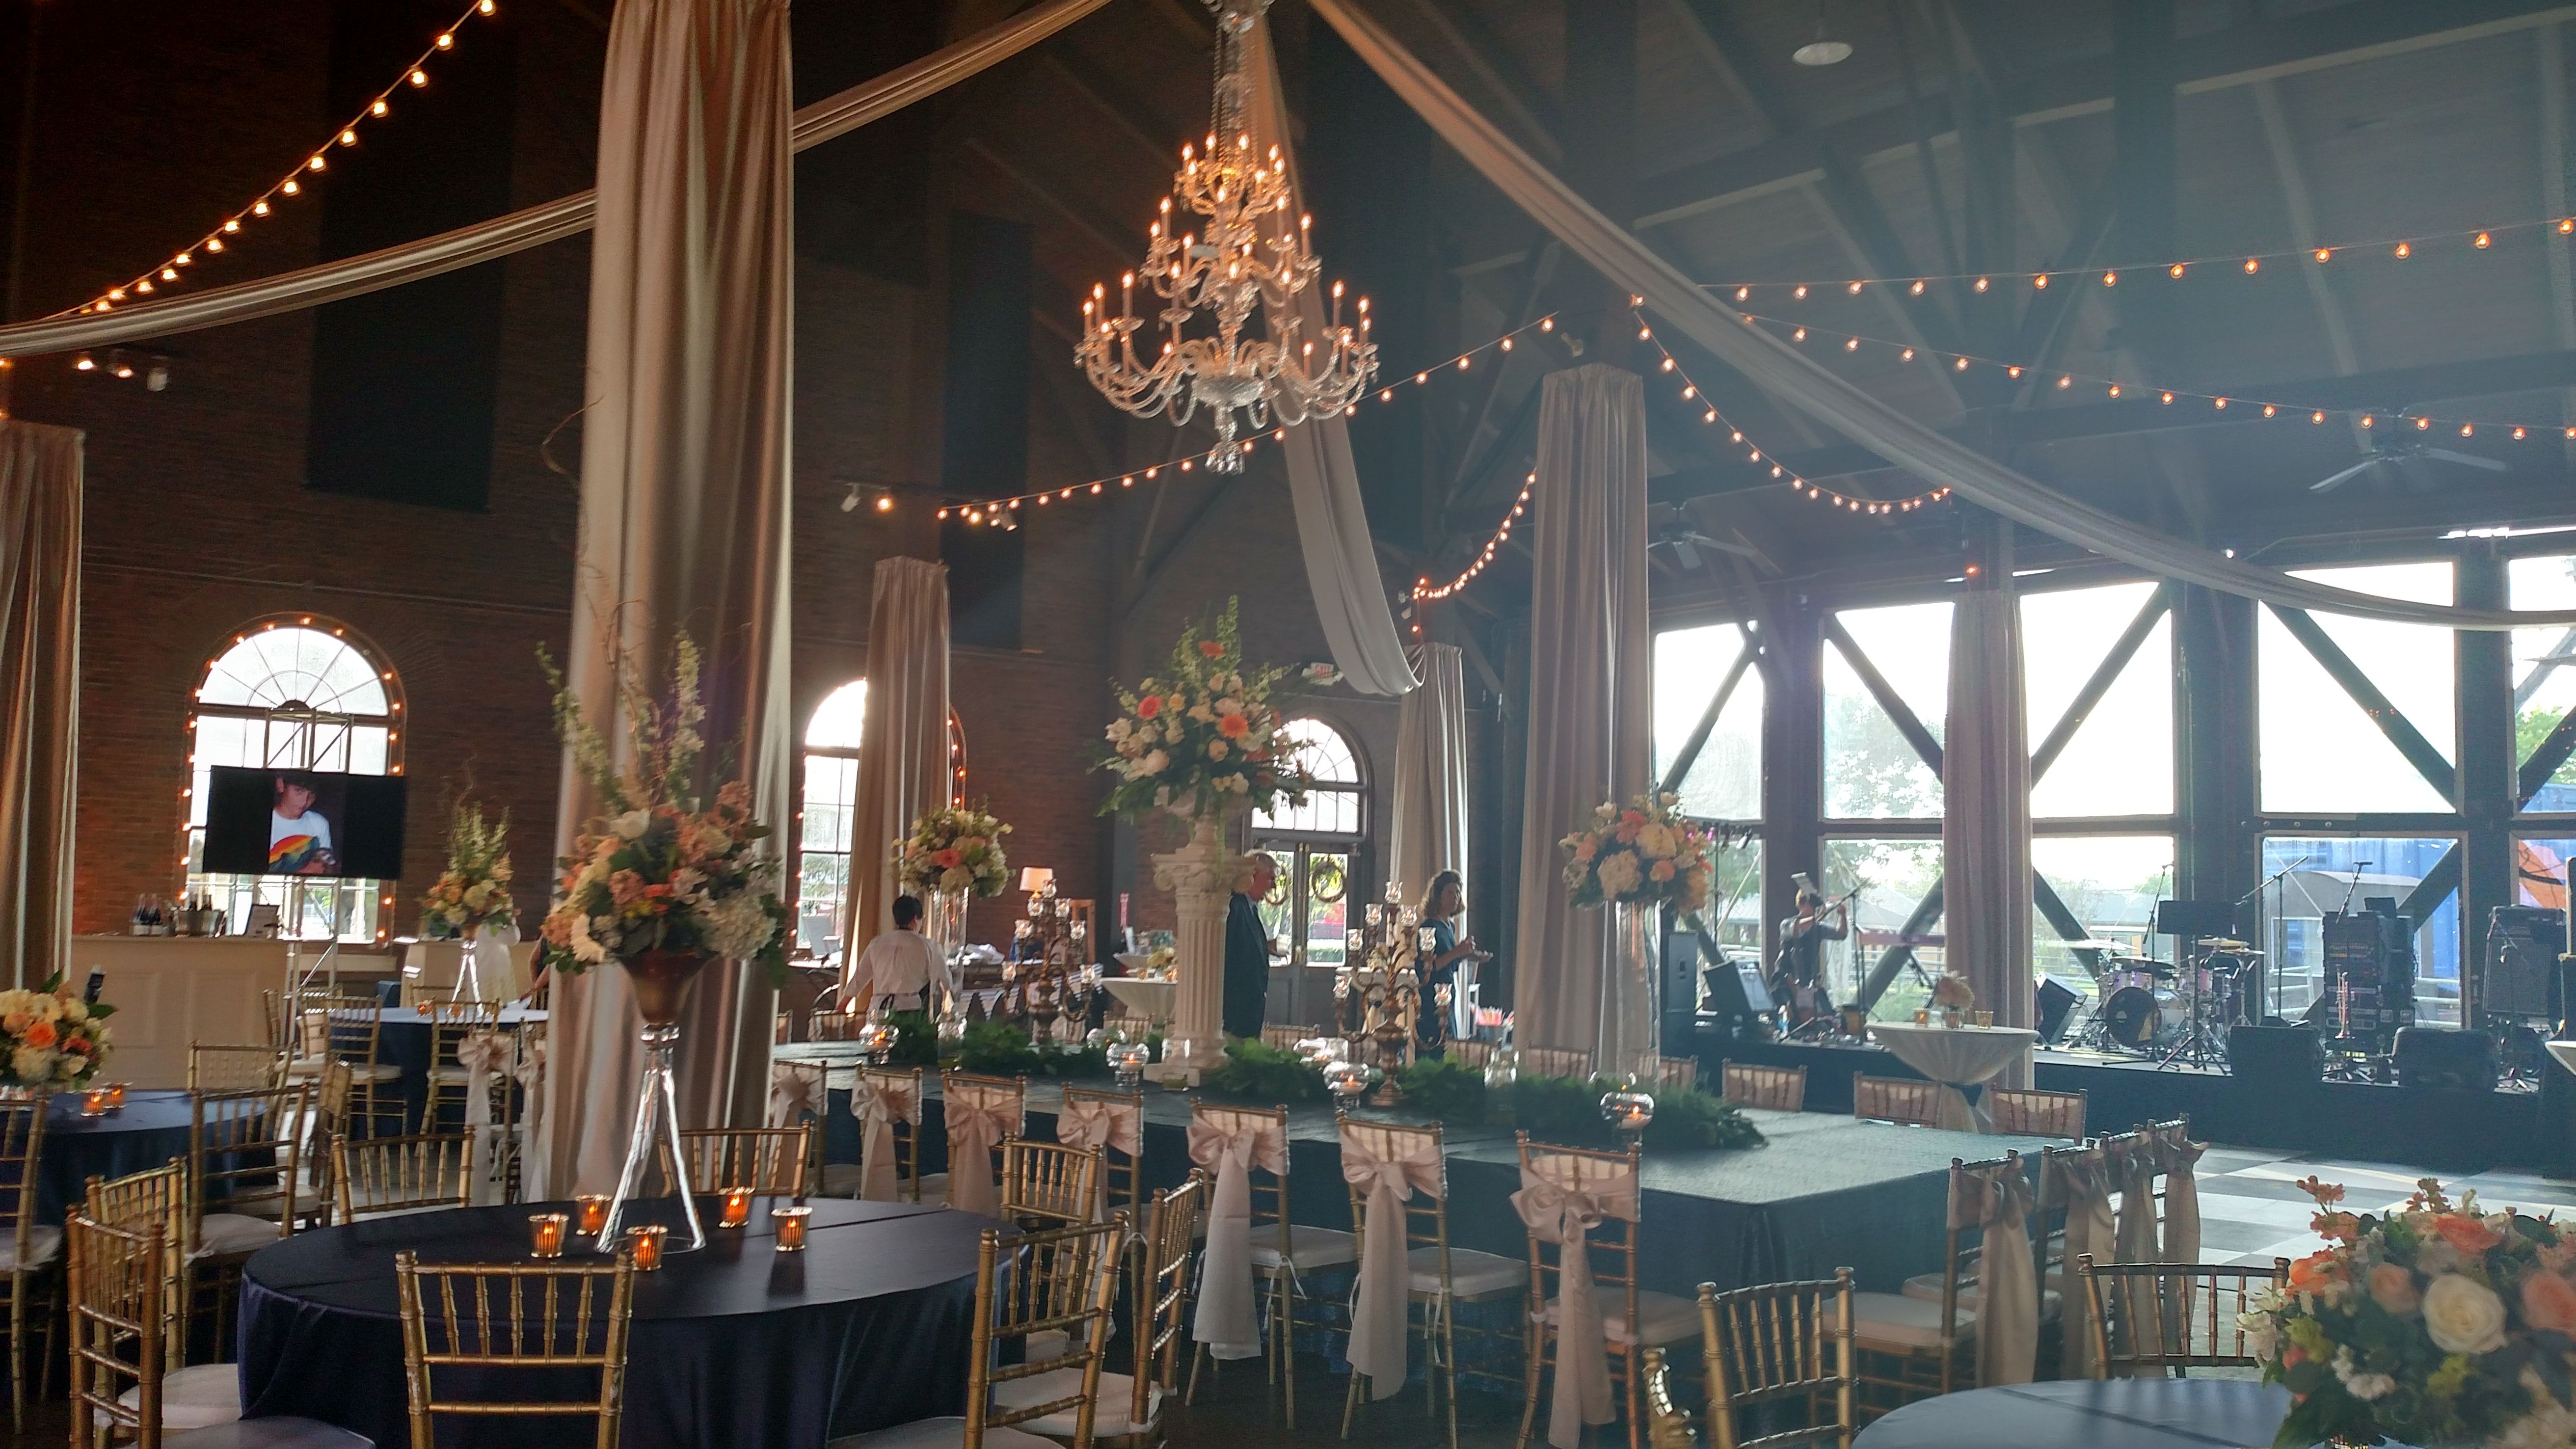 Huntsville Historic Depot Roundhouse wedding venue | Venue ...